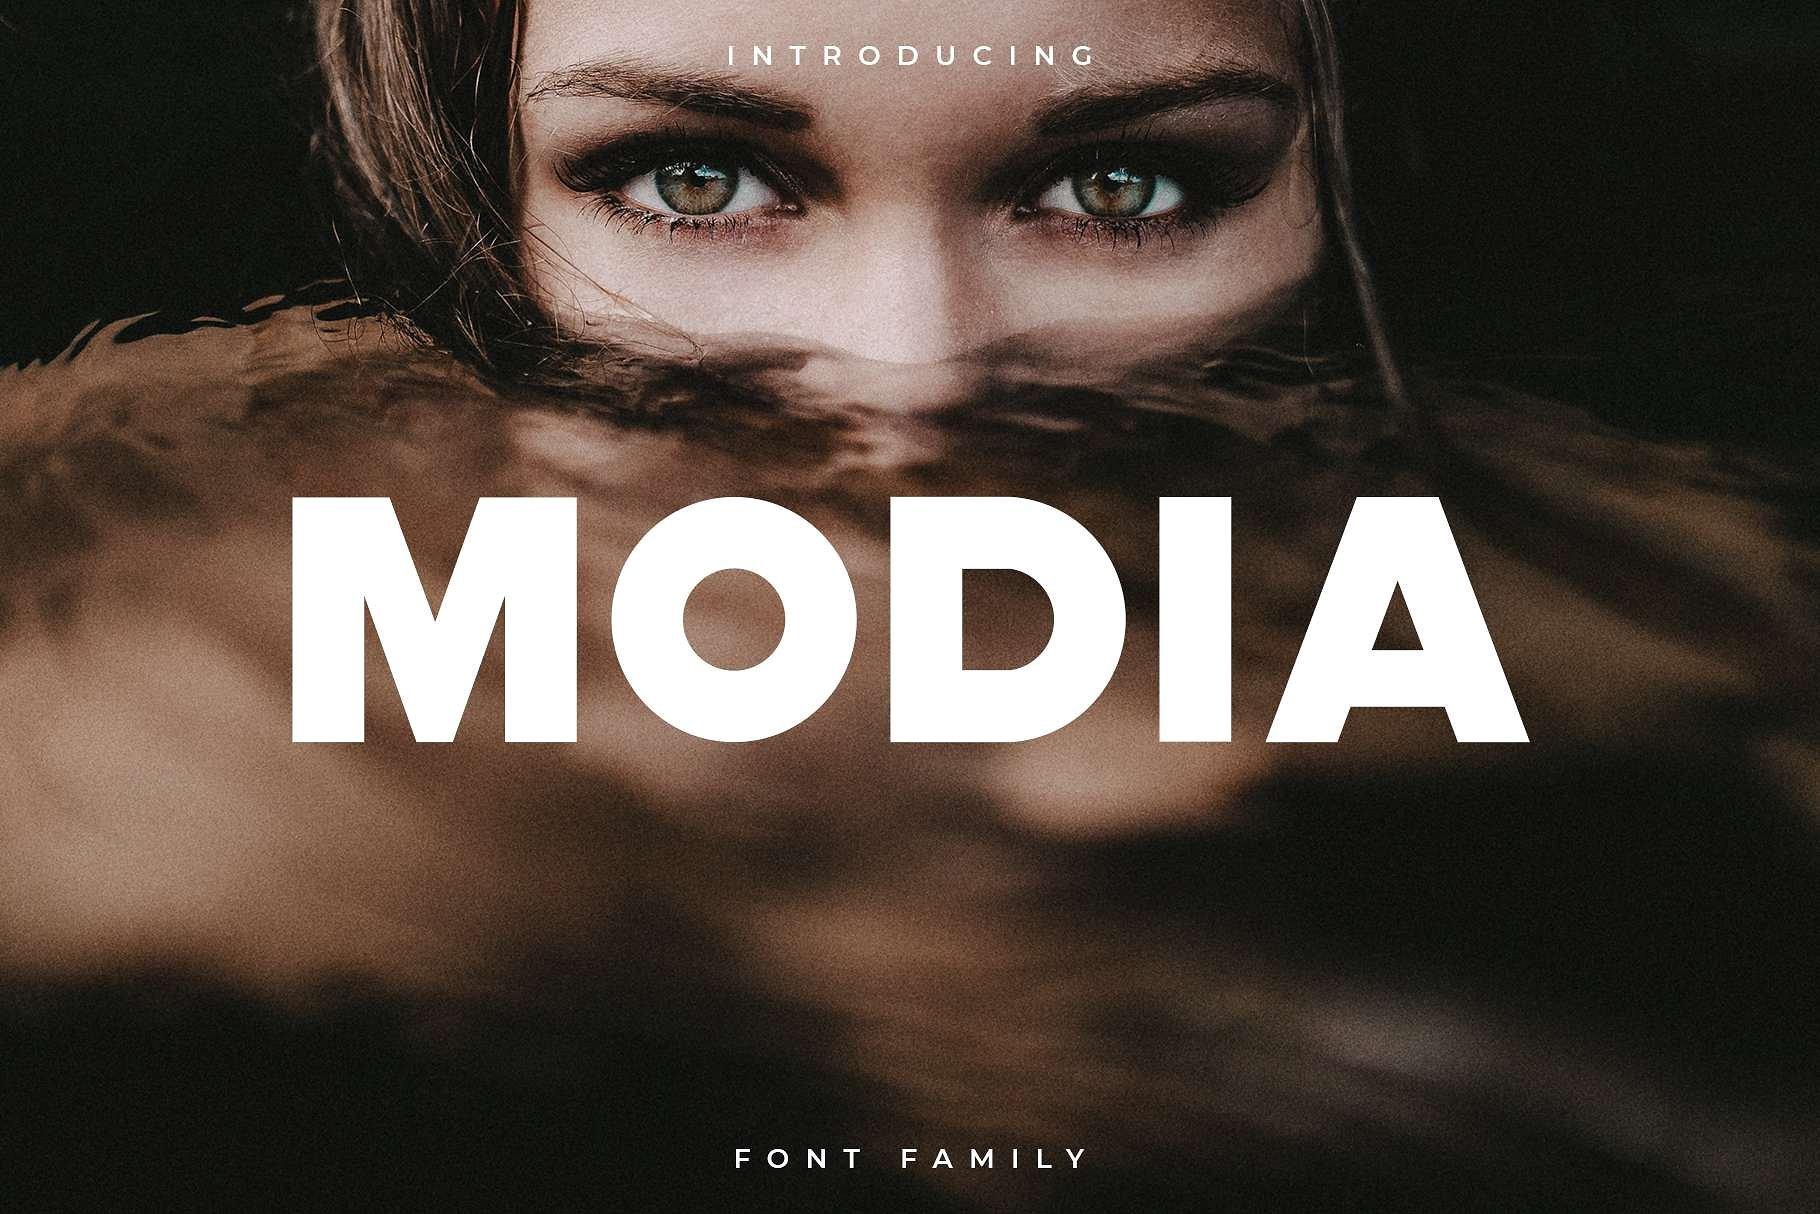 modia-font-family